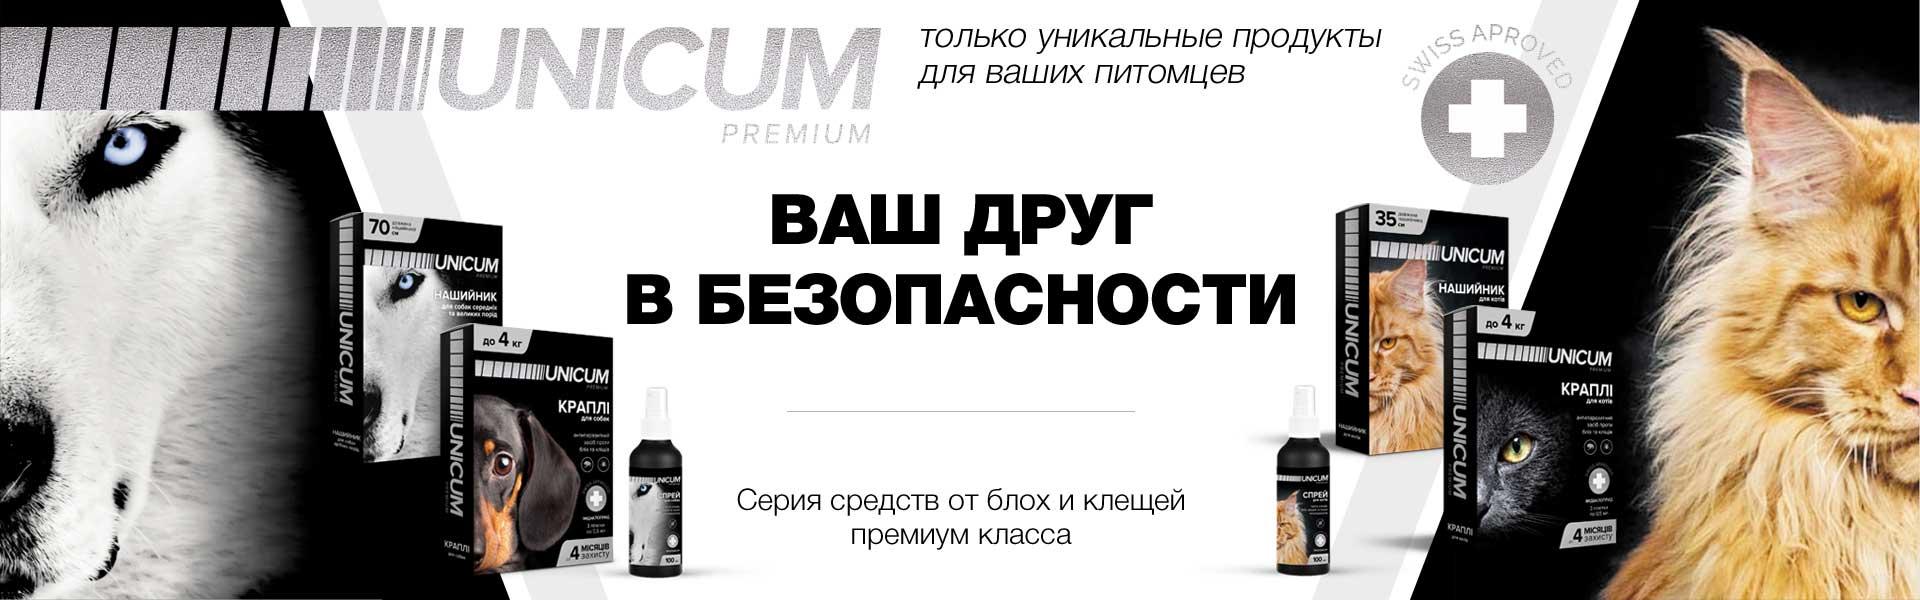 Unicum новинка